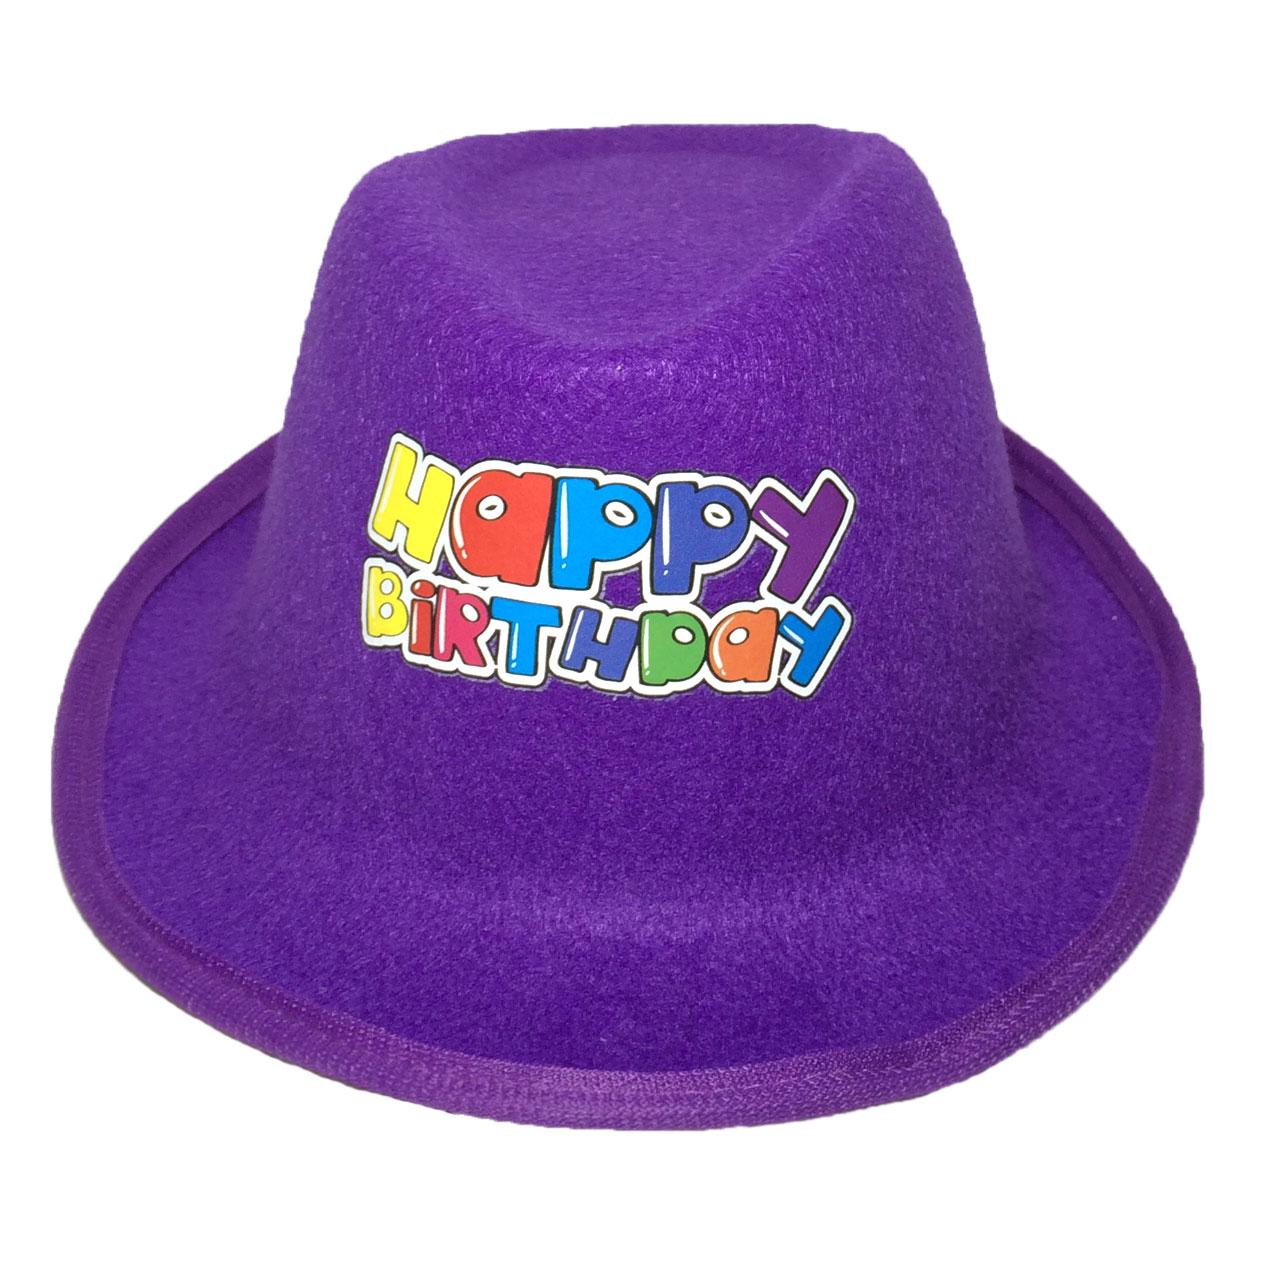 عکس کلاه جشن تولد طرح Happy Birthday کد 2